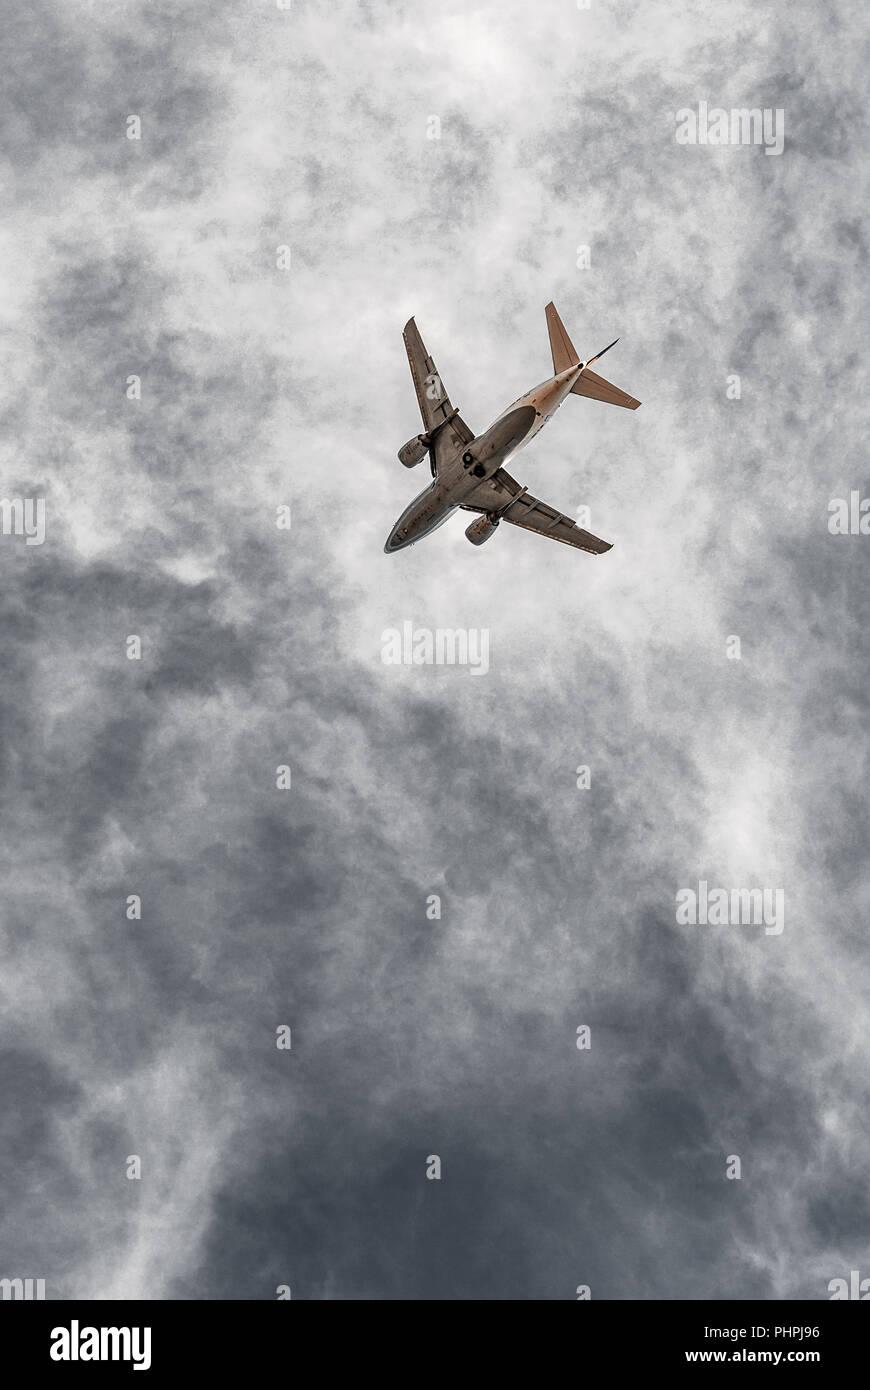 Airplane, Aircraft bottom, flying, take-off, landing - Stock Image